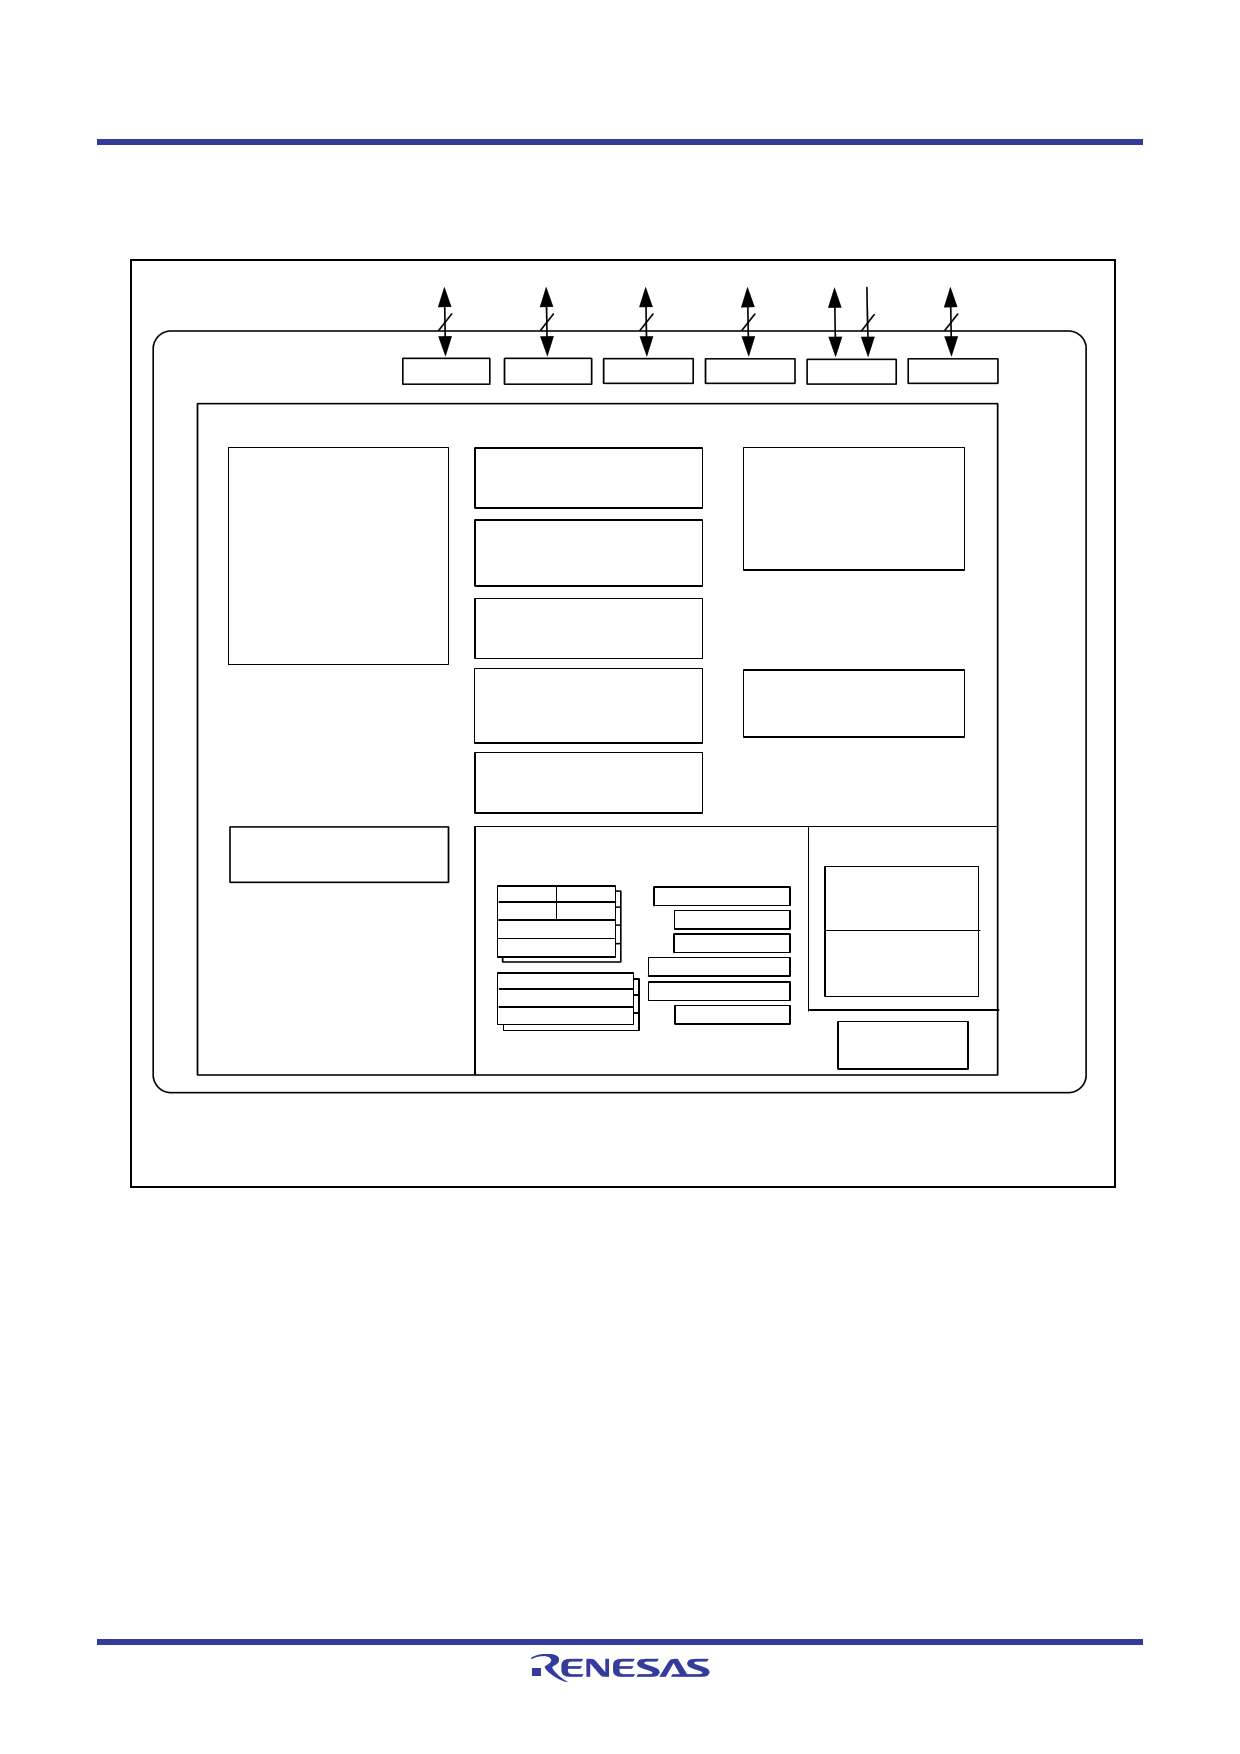 R5F21236KFP pdf, 반도체, 판매, 대치품